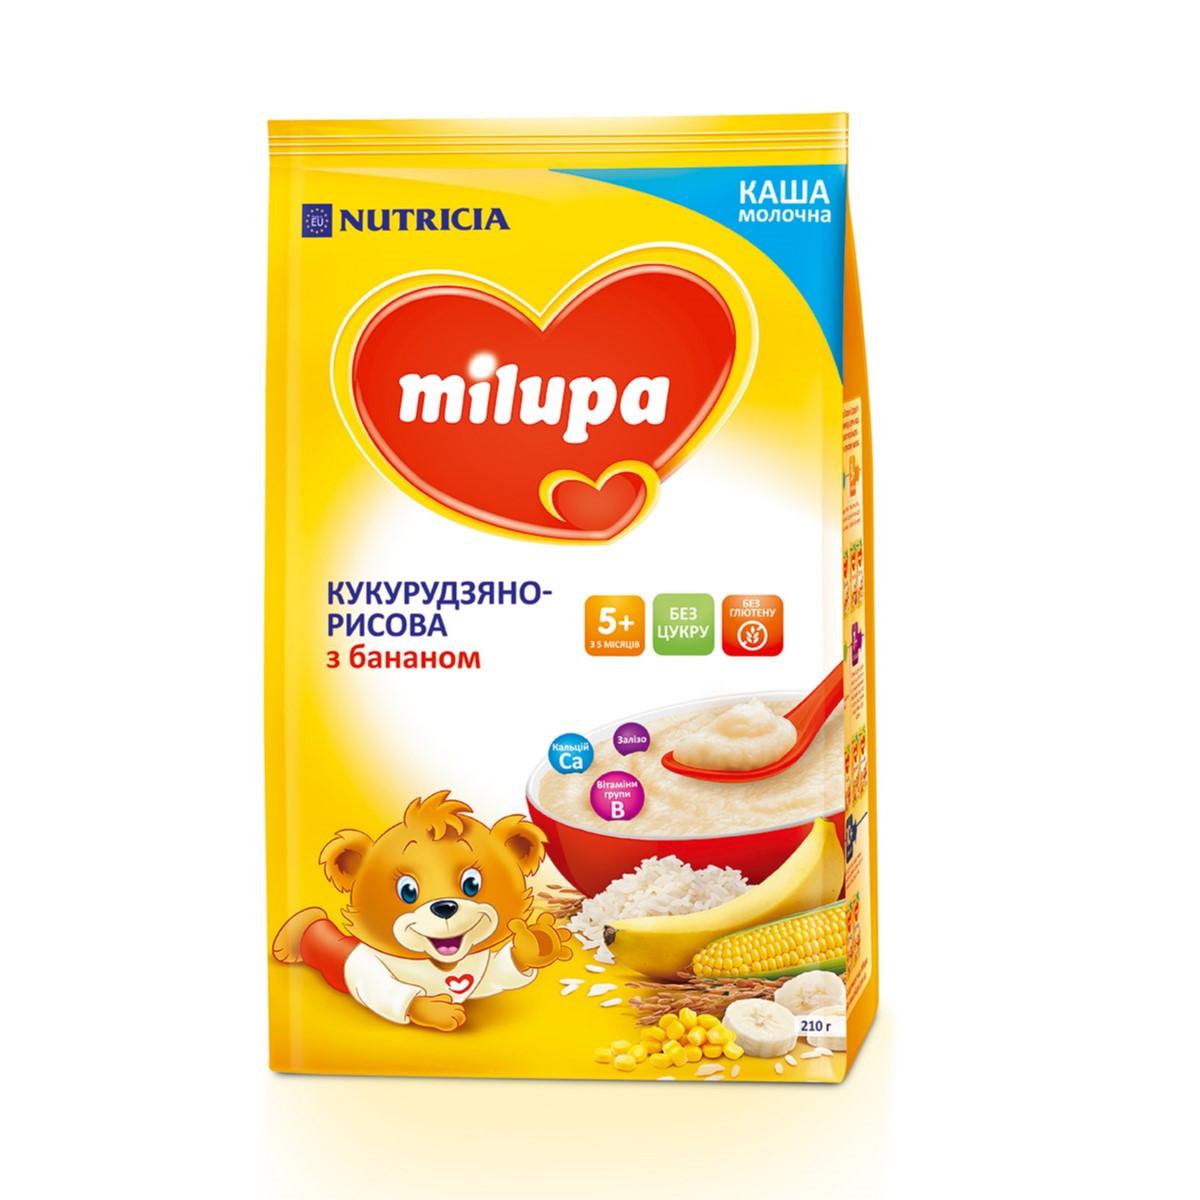 Каша молочна Milupa Рисова з бананом, 5+, 210г